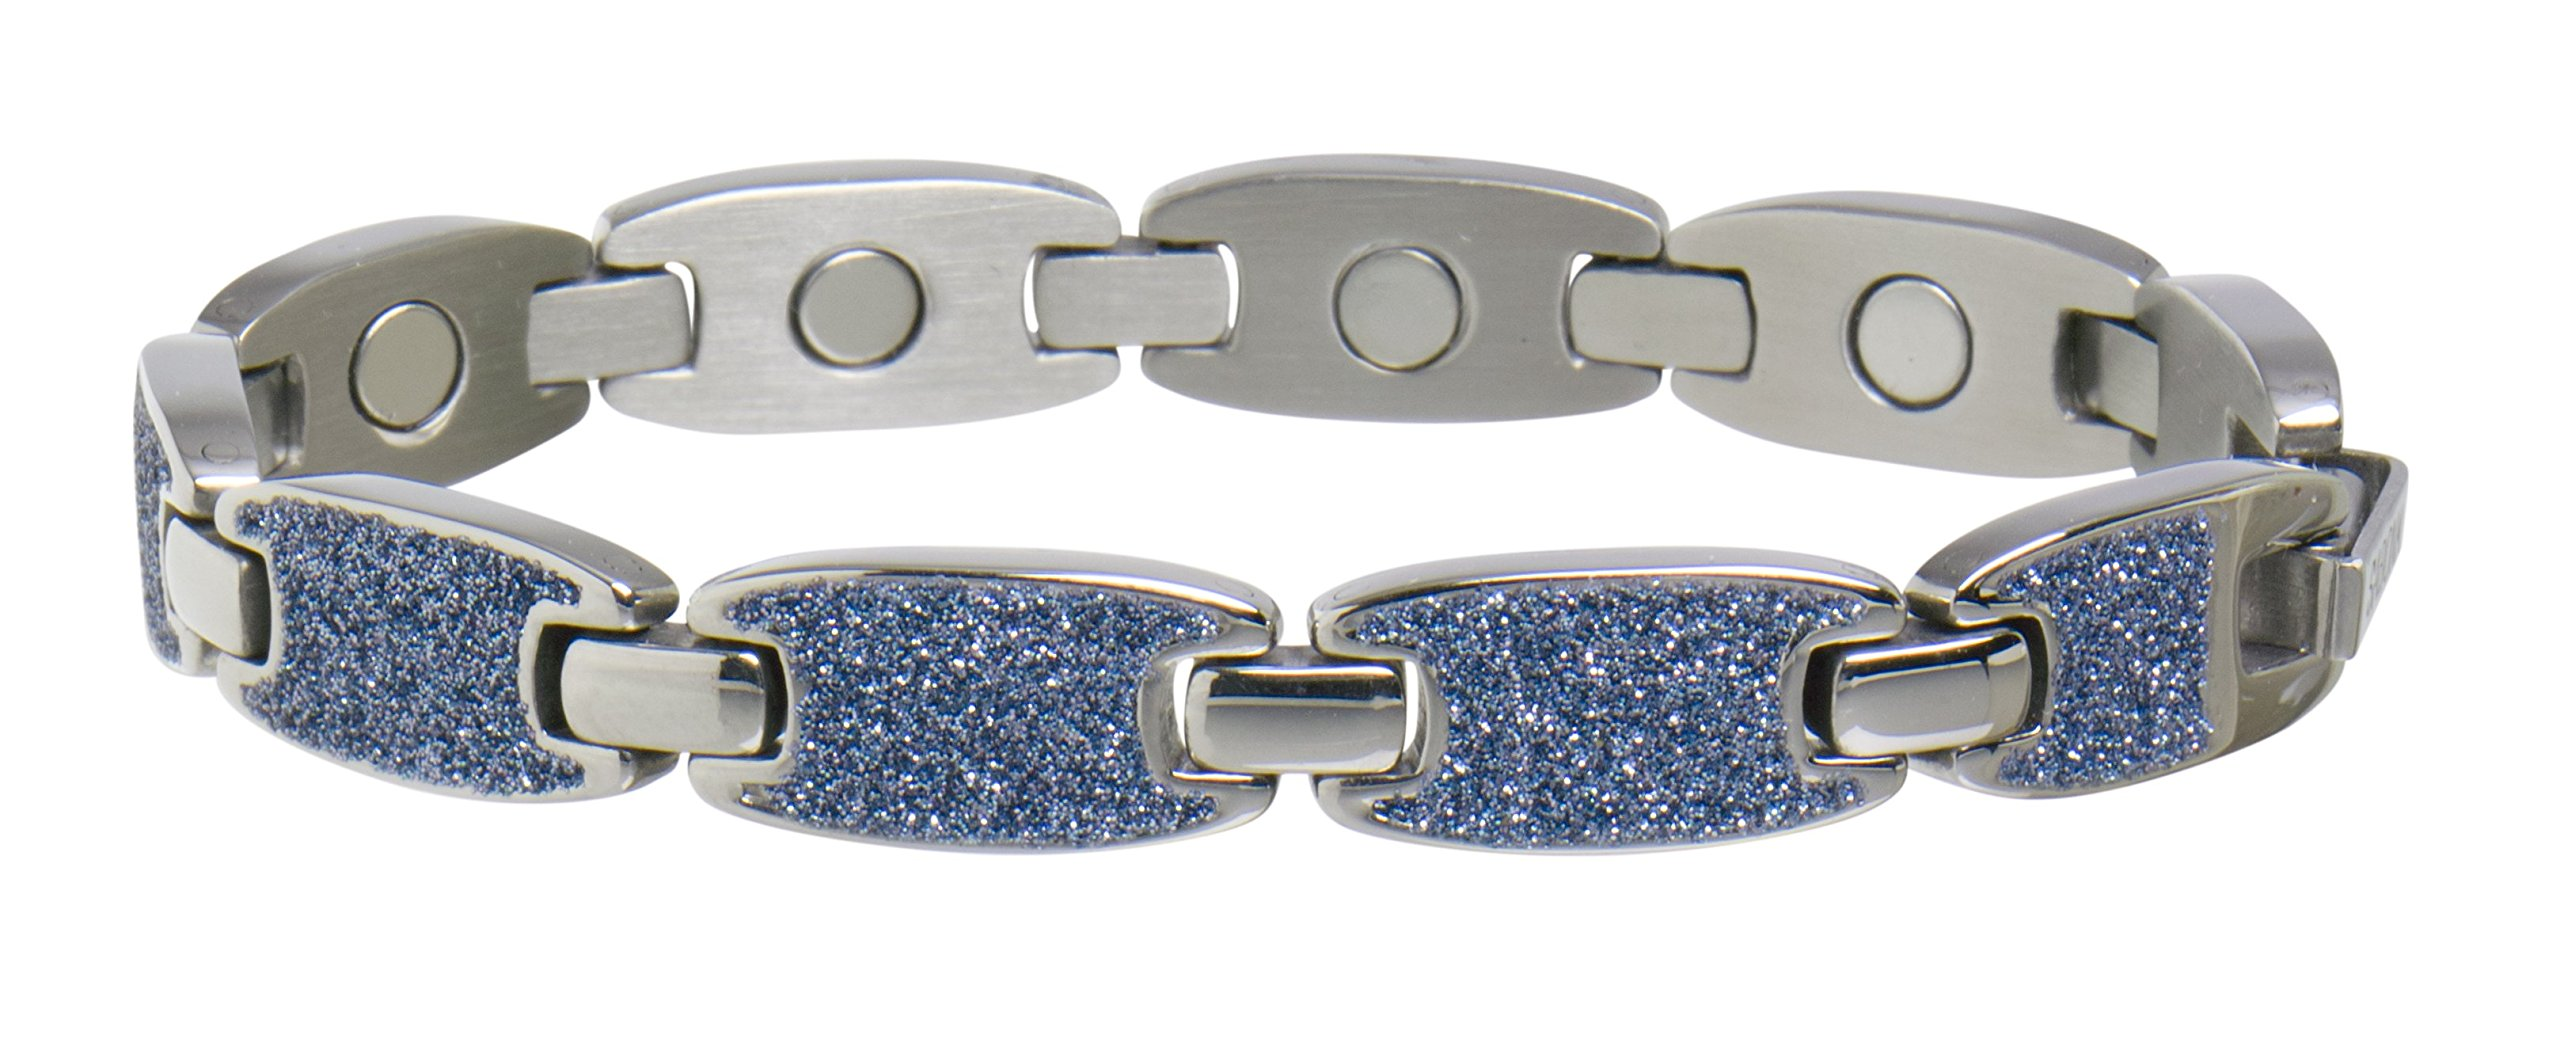 Sabona 28165 Caribbean Ocean Magnetic Bracelet in Silver, 0.1 Ounce